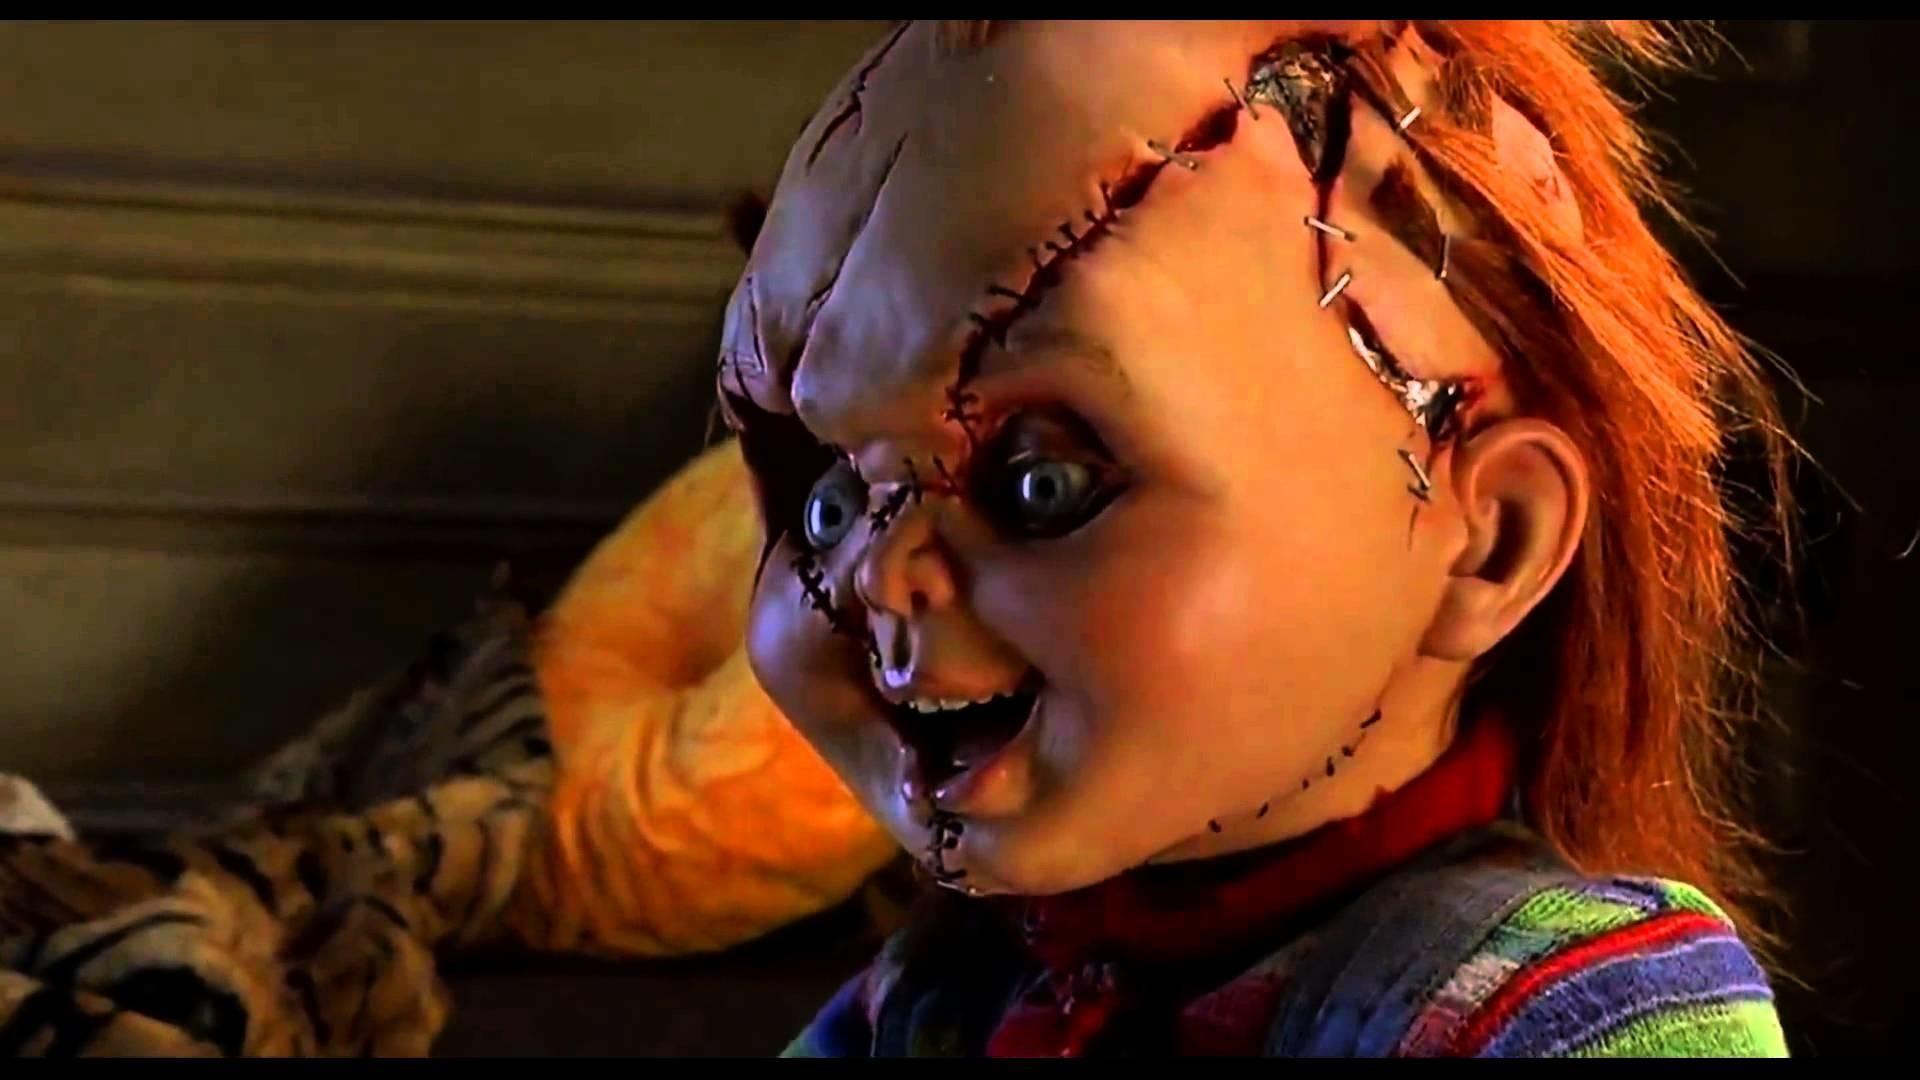 I love you – Bride of Chucky [1080p HD]